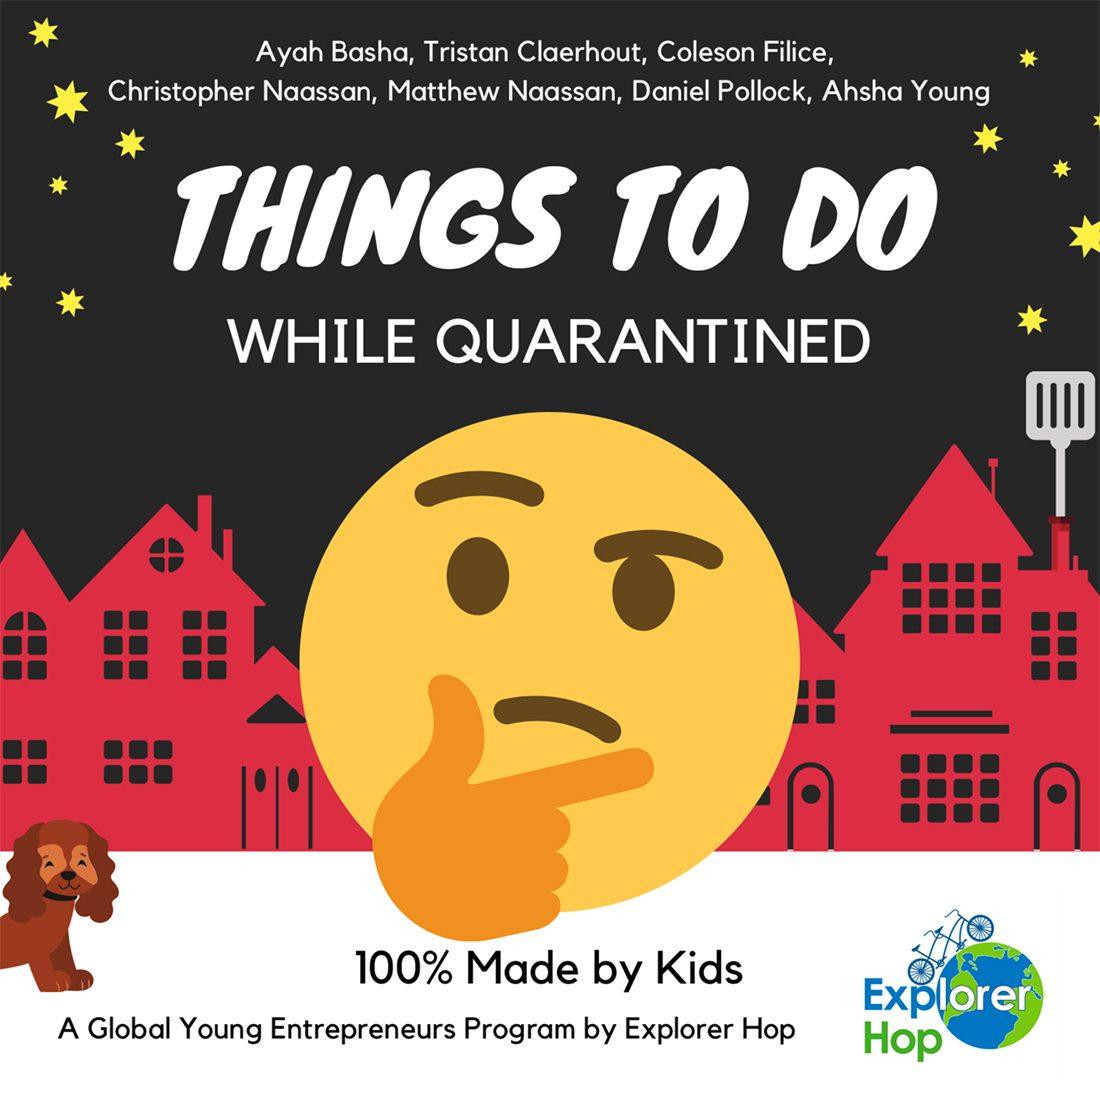 Quarantine activities for kids